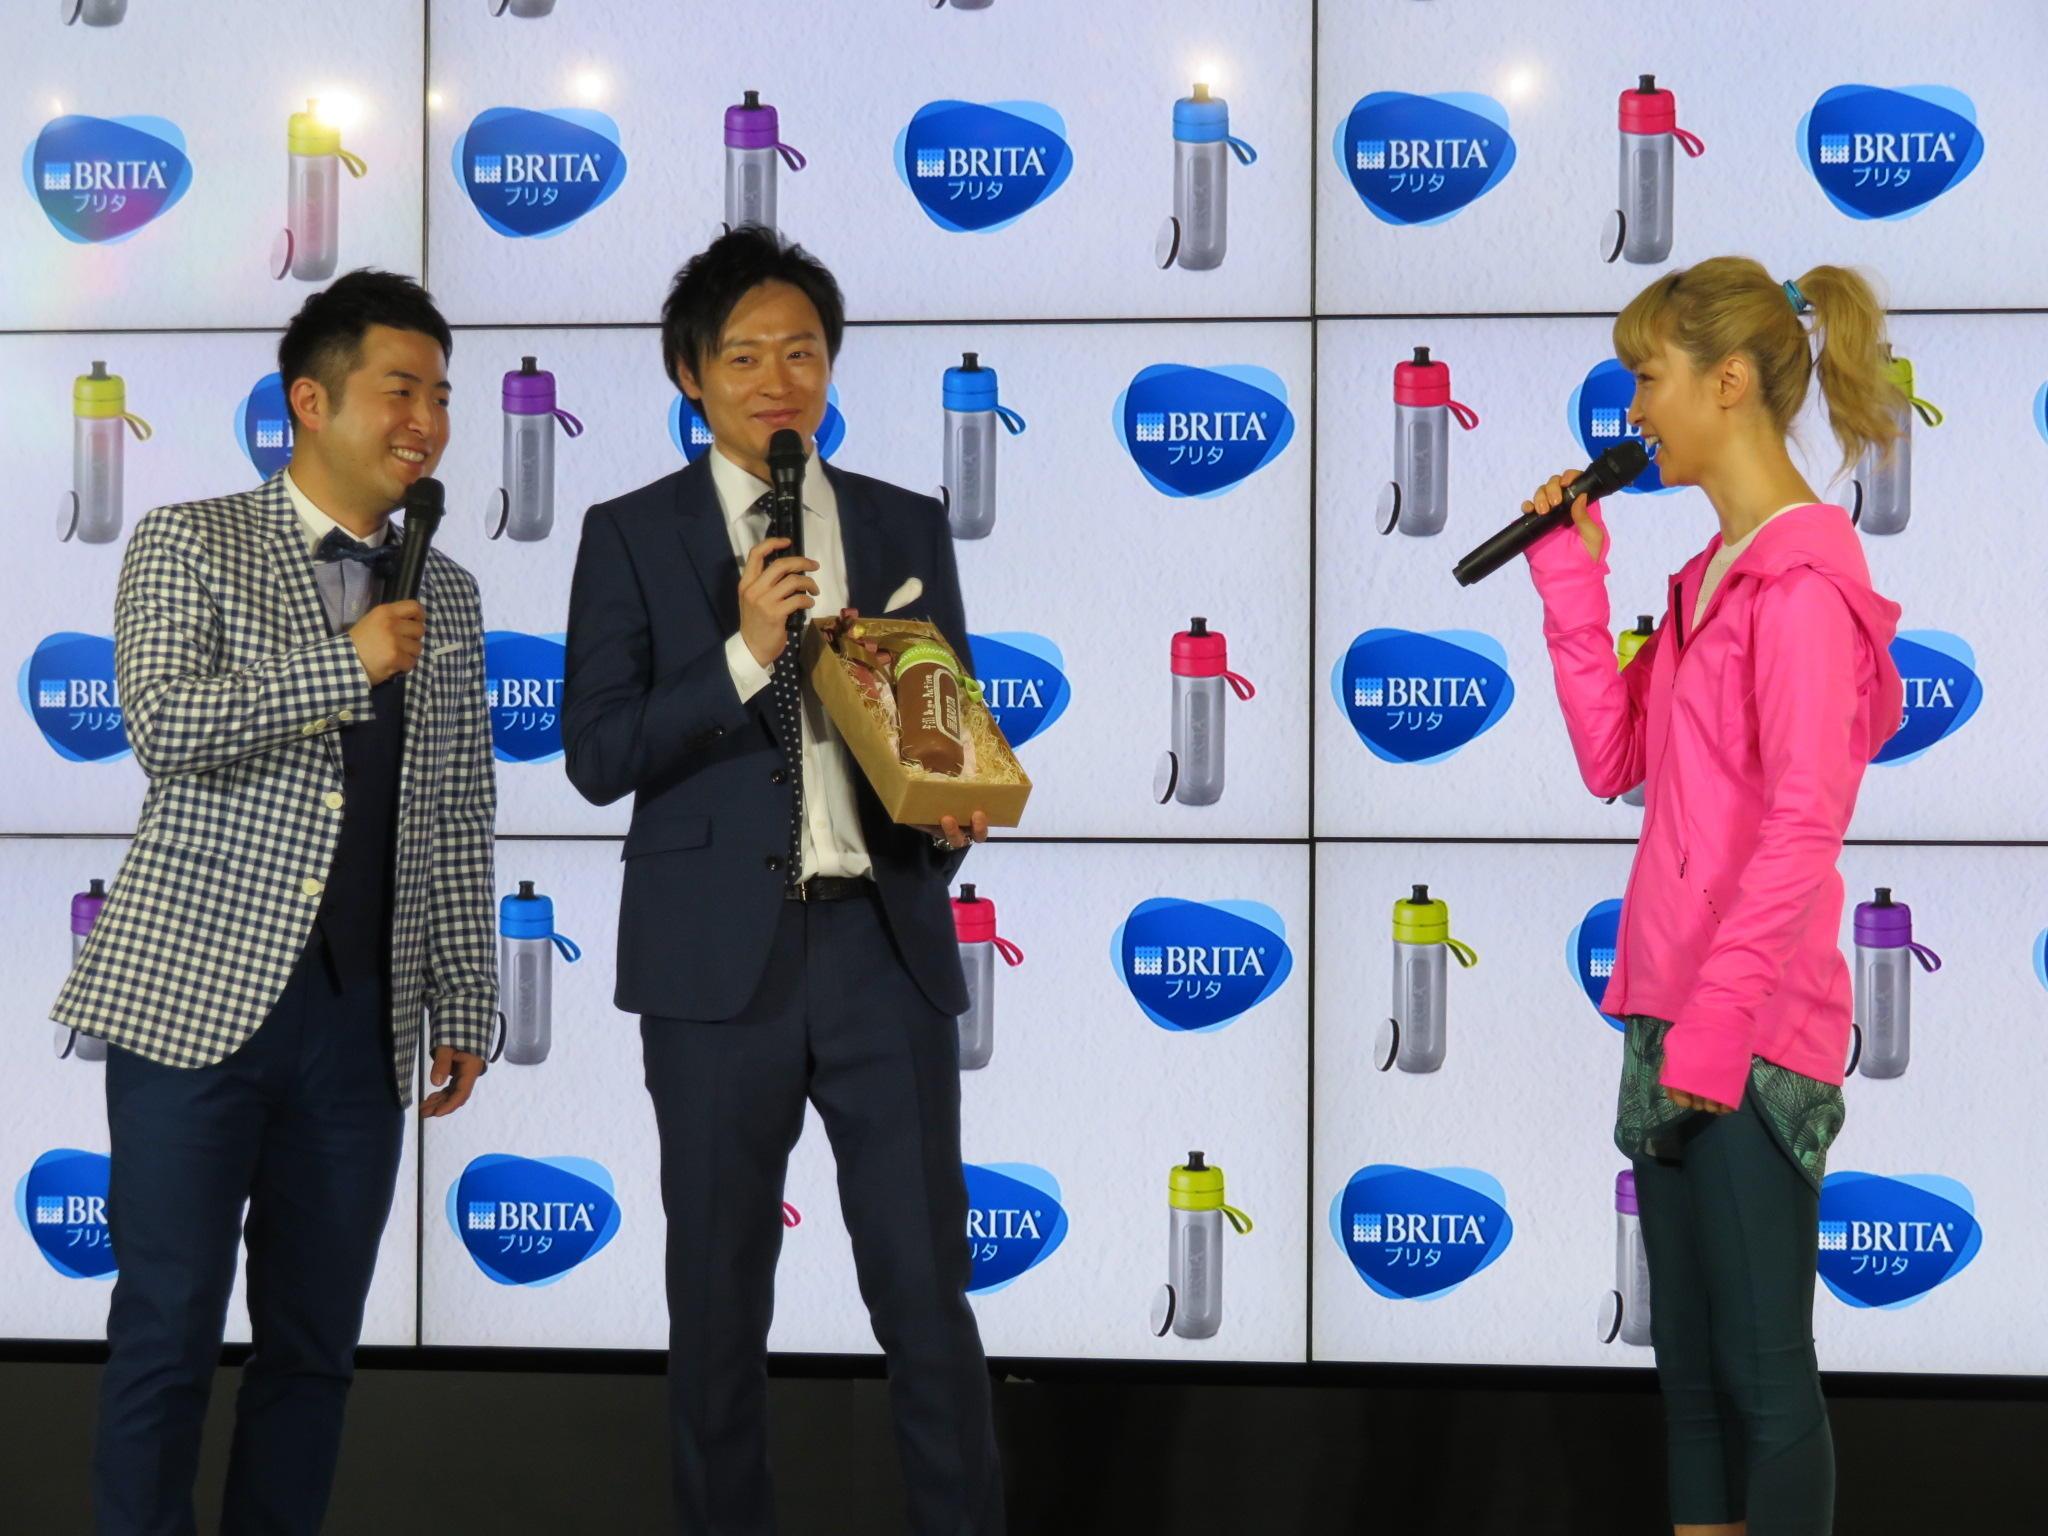 http://news.yoshimoto.co.jp/20180207191002-cae2f1d2a119811af56a05c369ff8e40bceca153.jpg